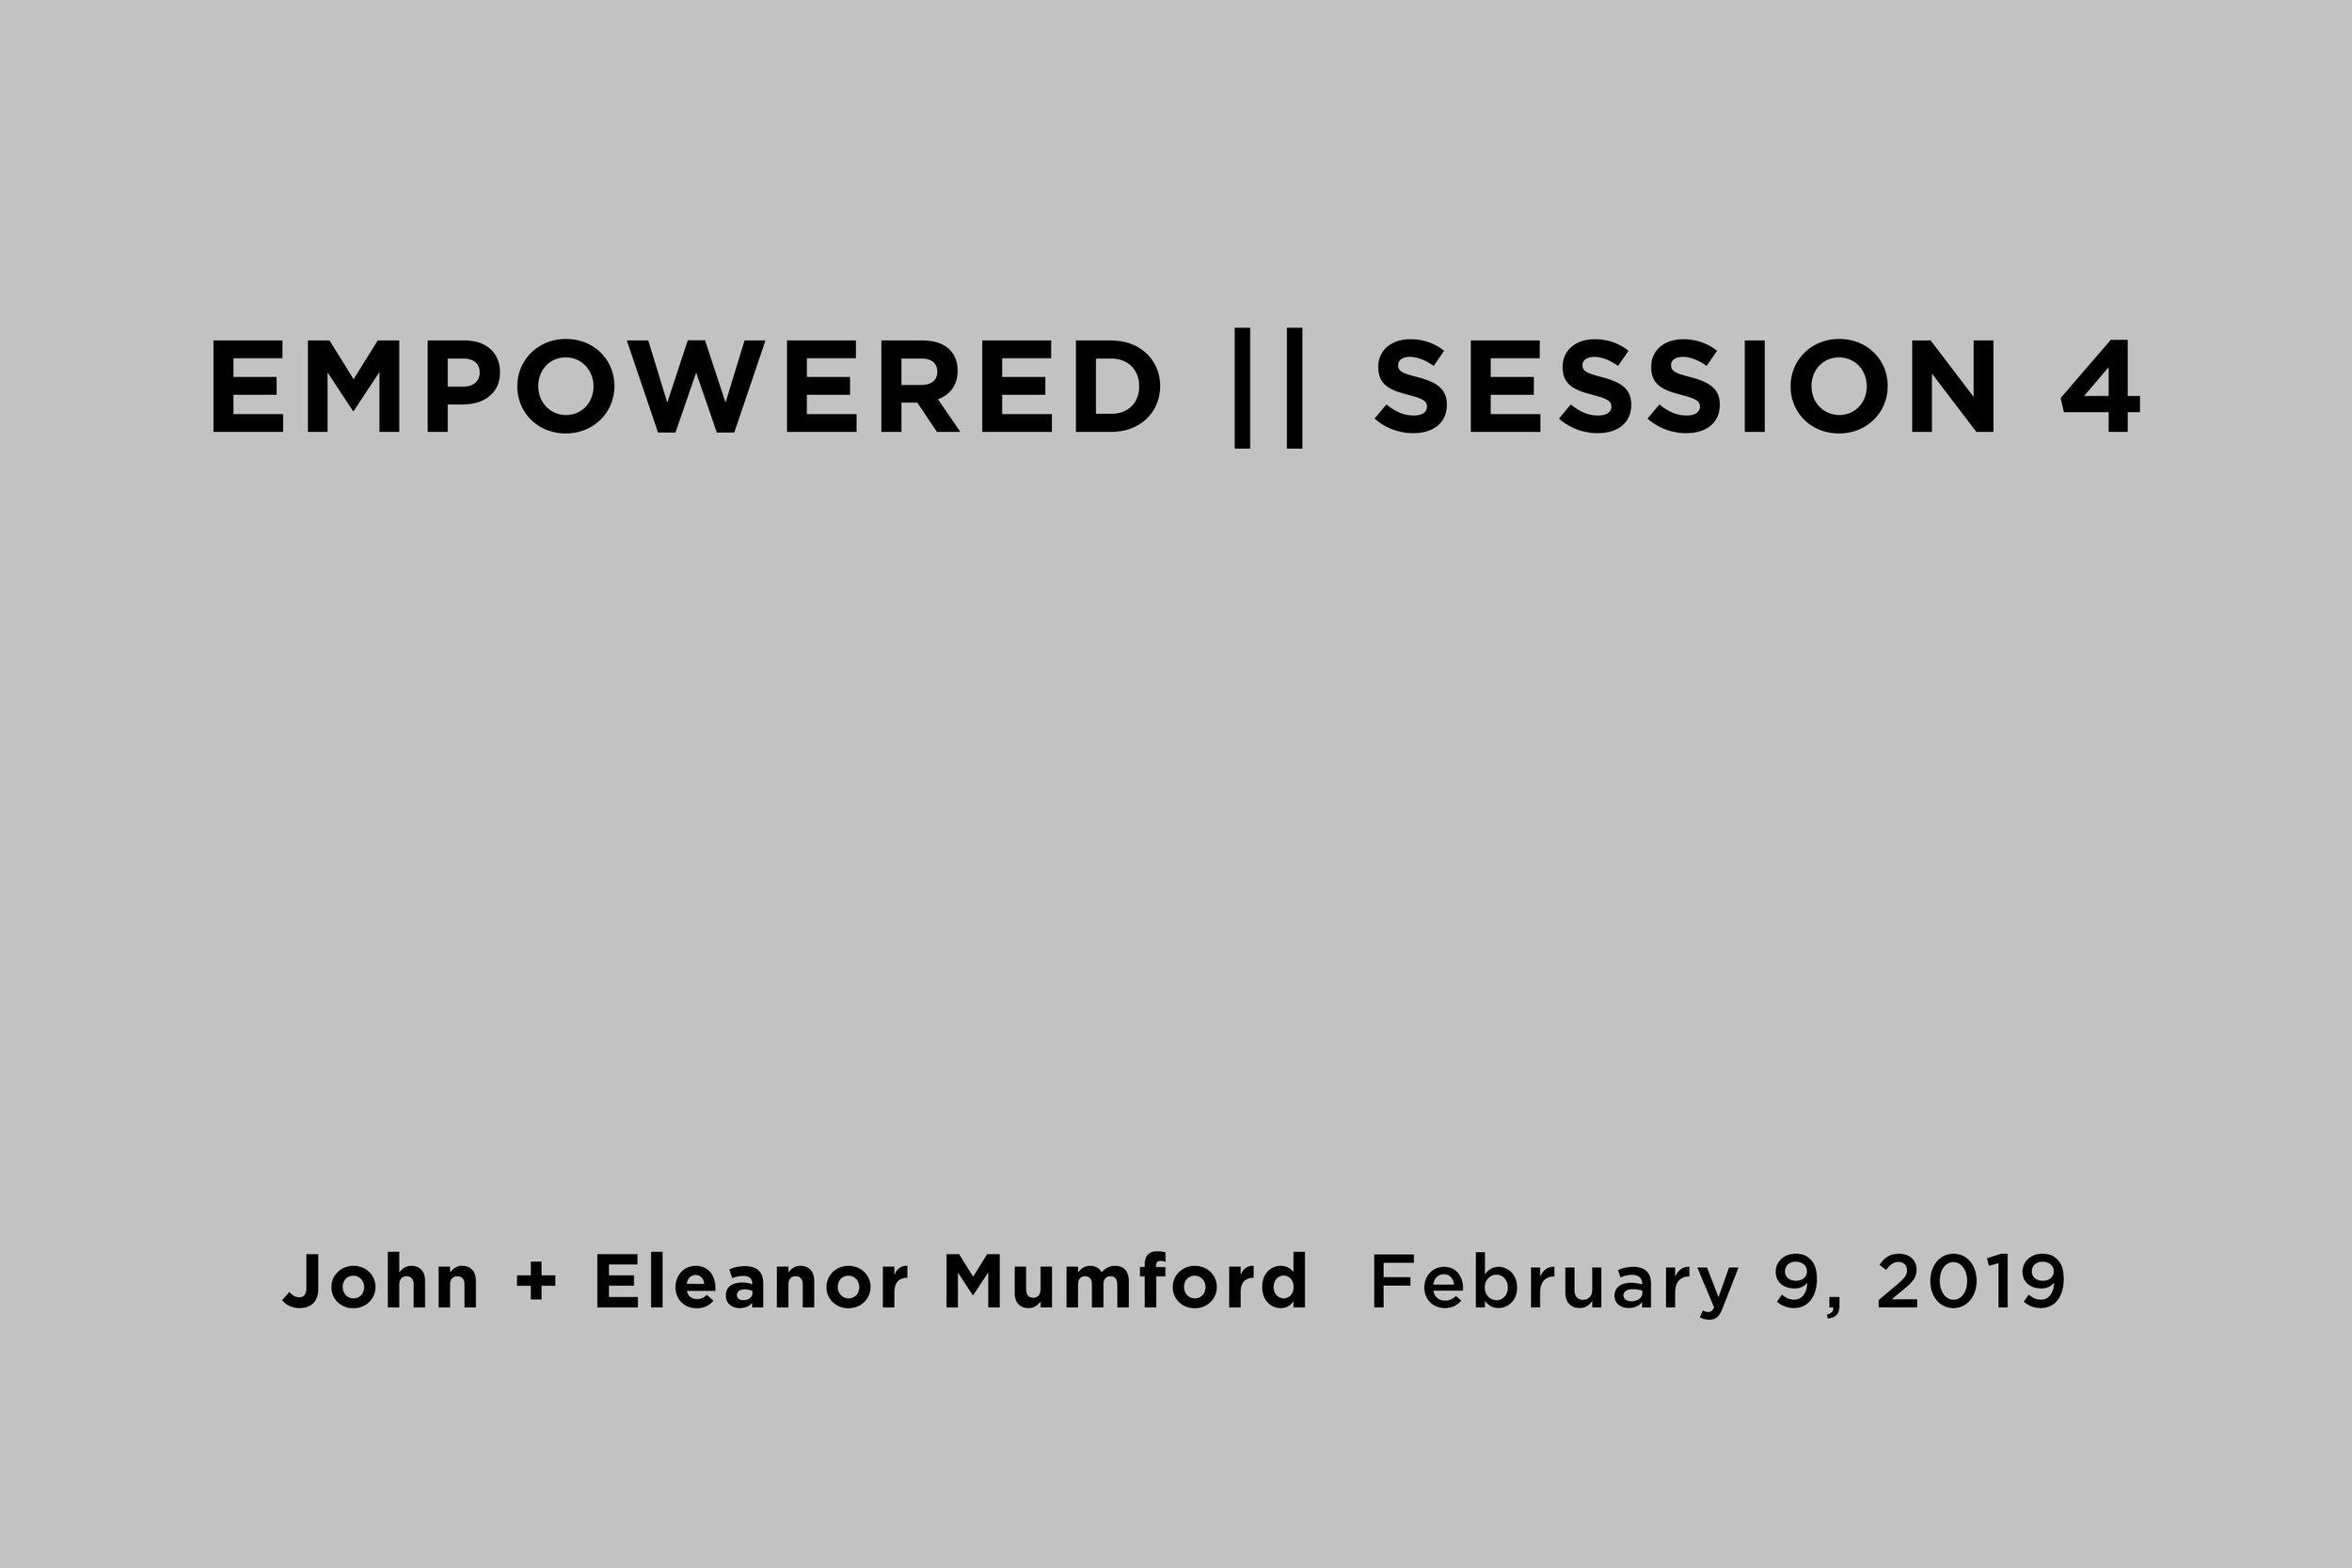 Empowered-Ses-4.jpg